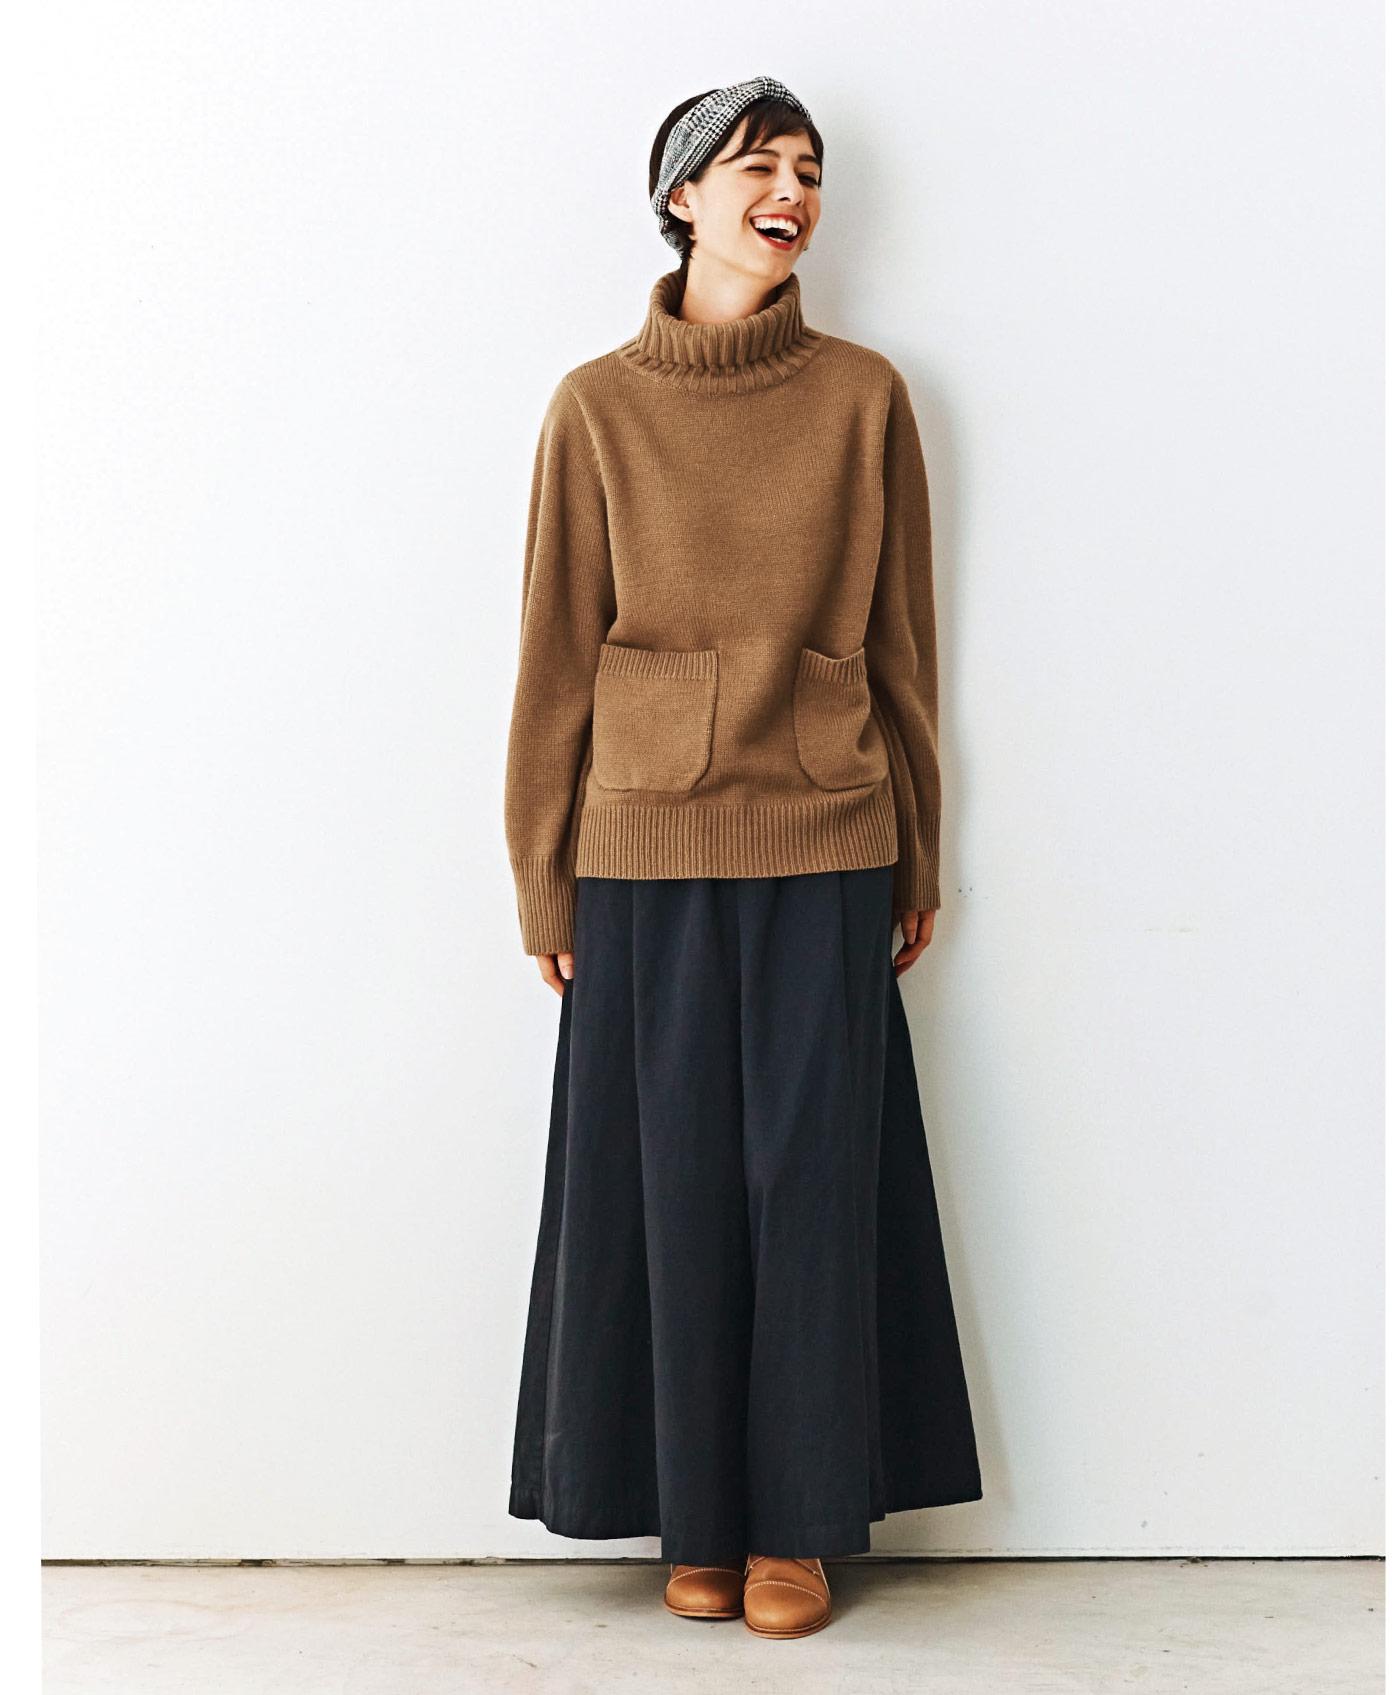 and myera ロングスカートみたいなキュロパン〈黒〉